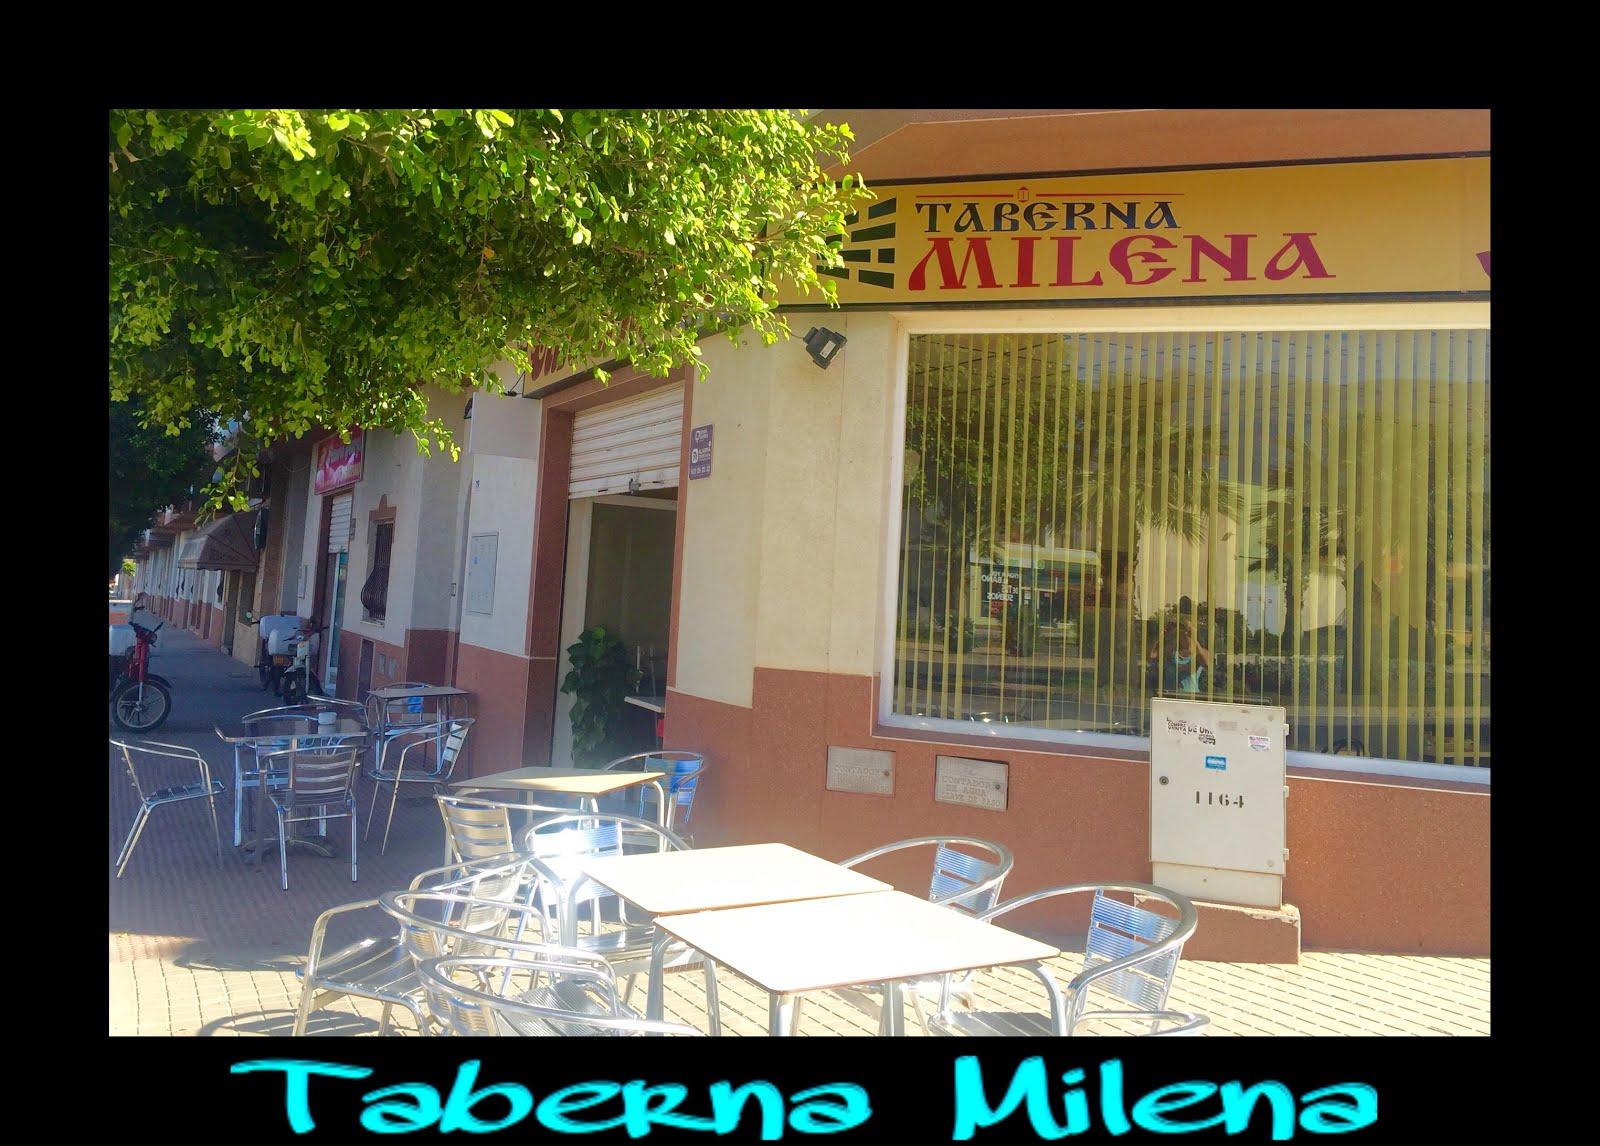 Taberna Milena